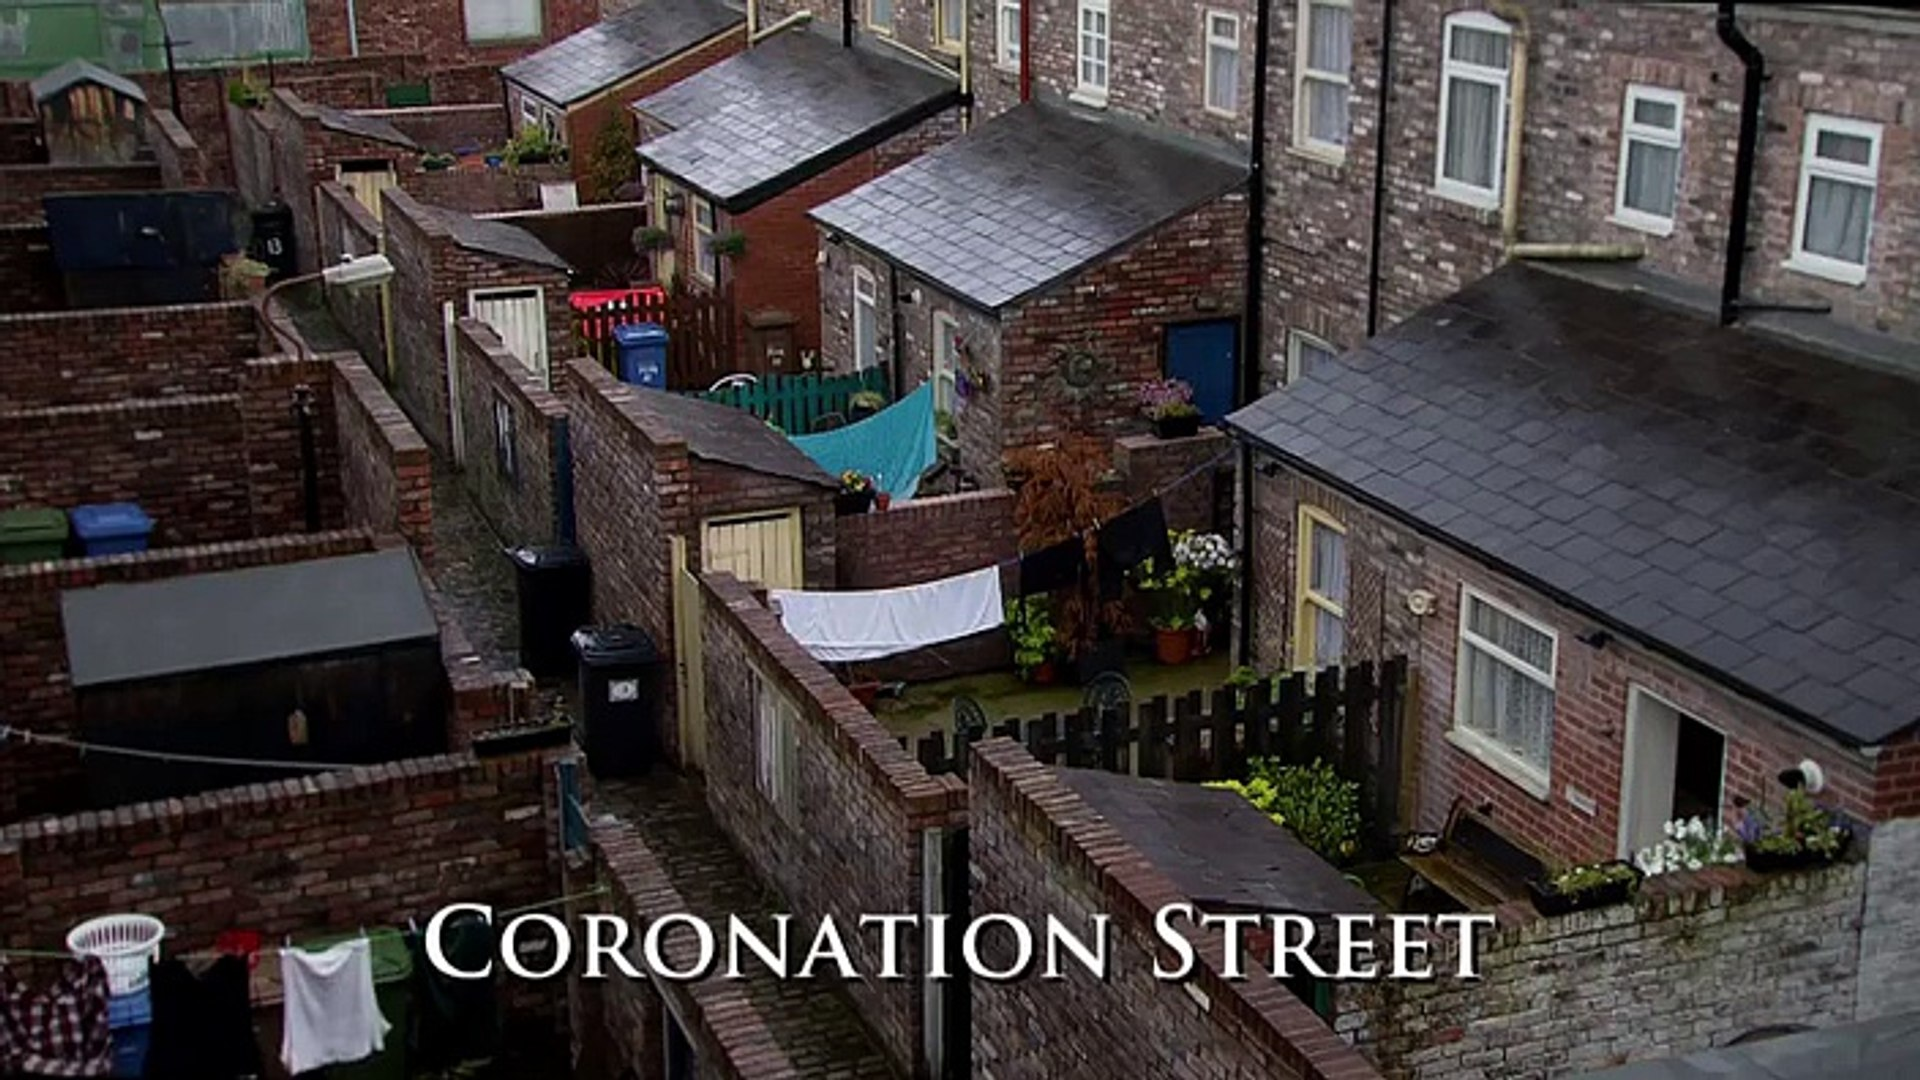 Coronation Street 16th March 2018 Part 2